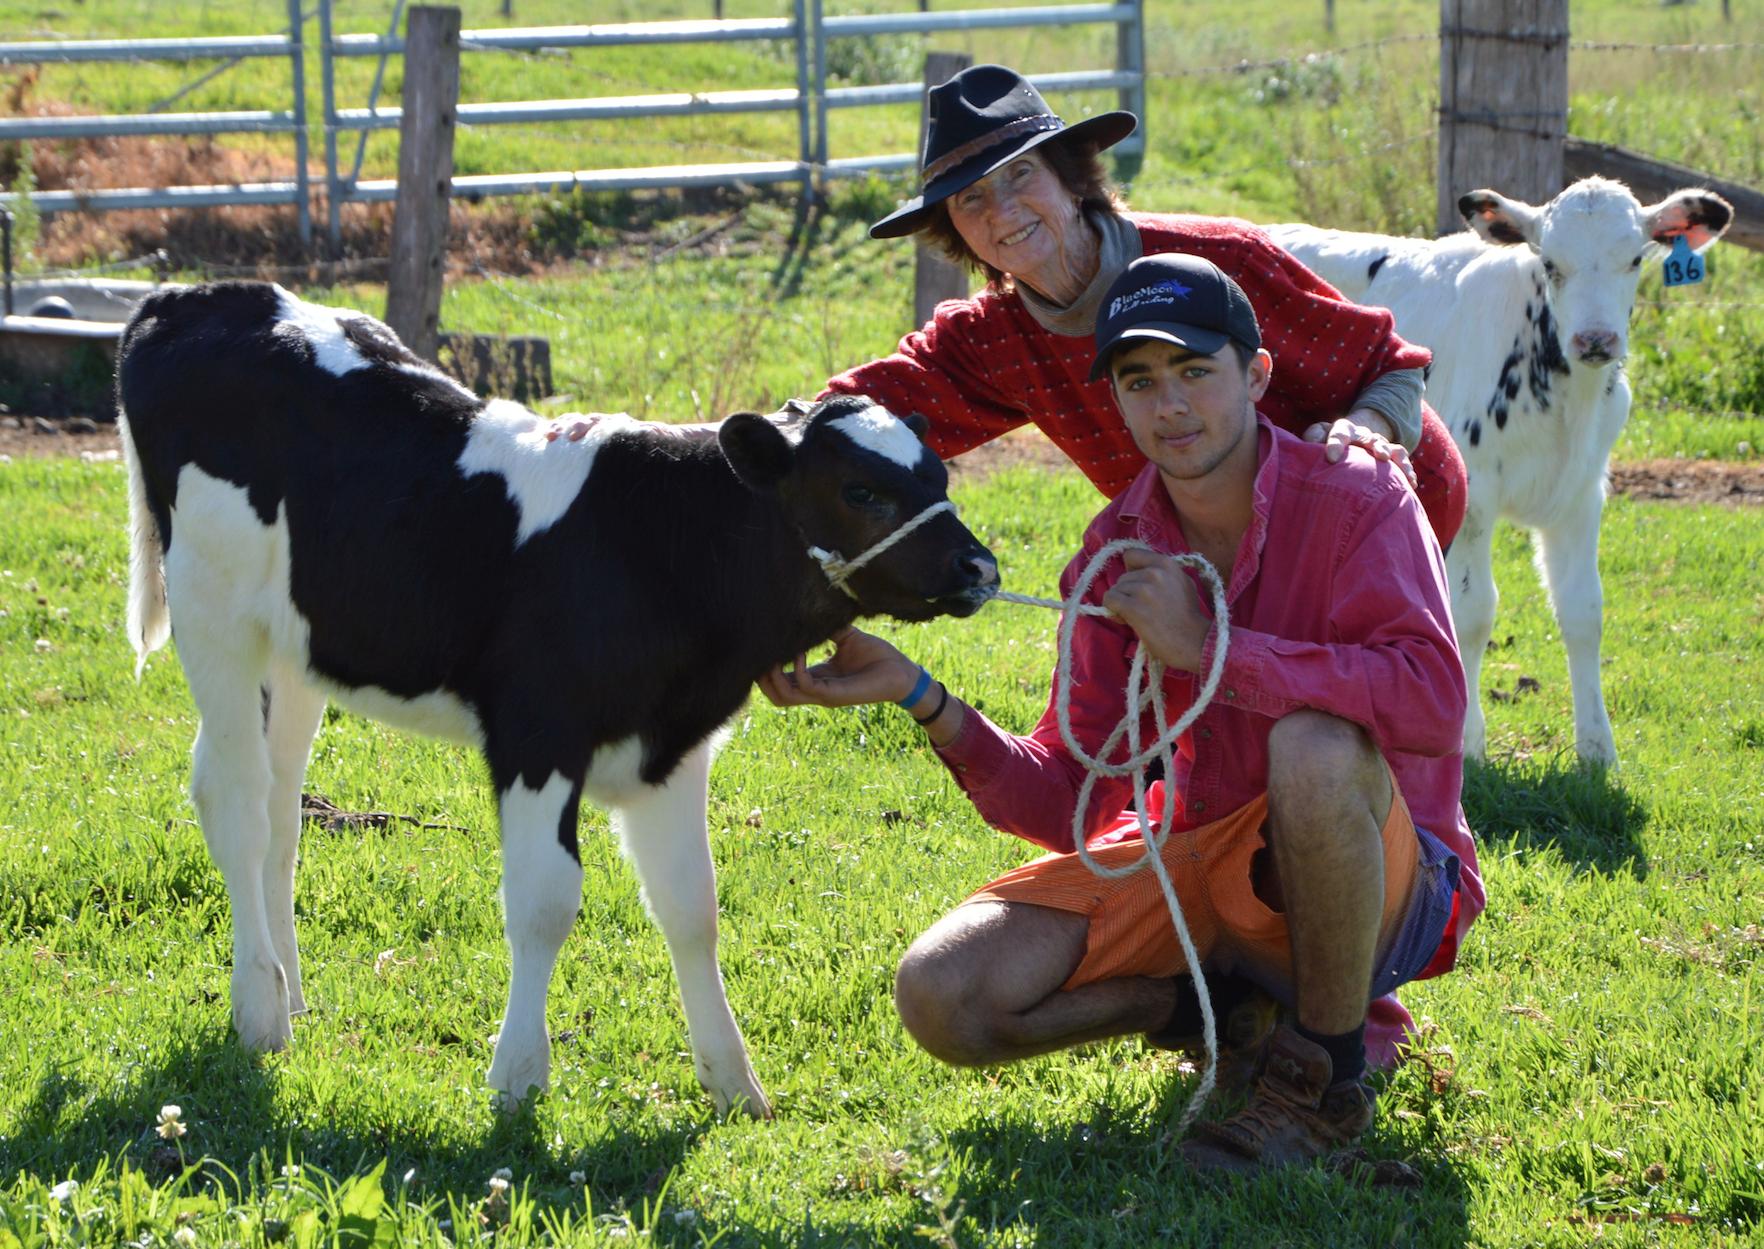 85 Year Old Kempsey Female Farmer Still Milks Every Day